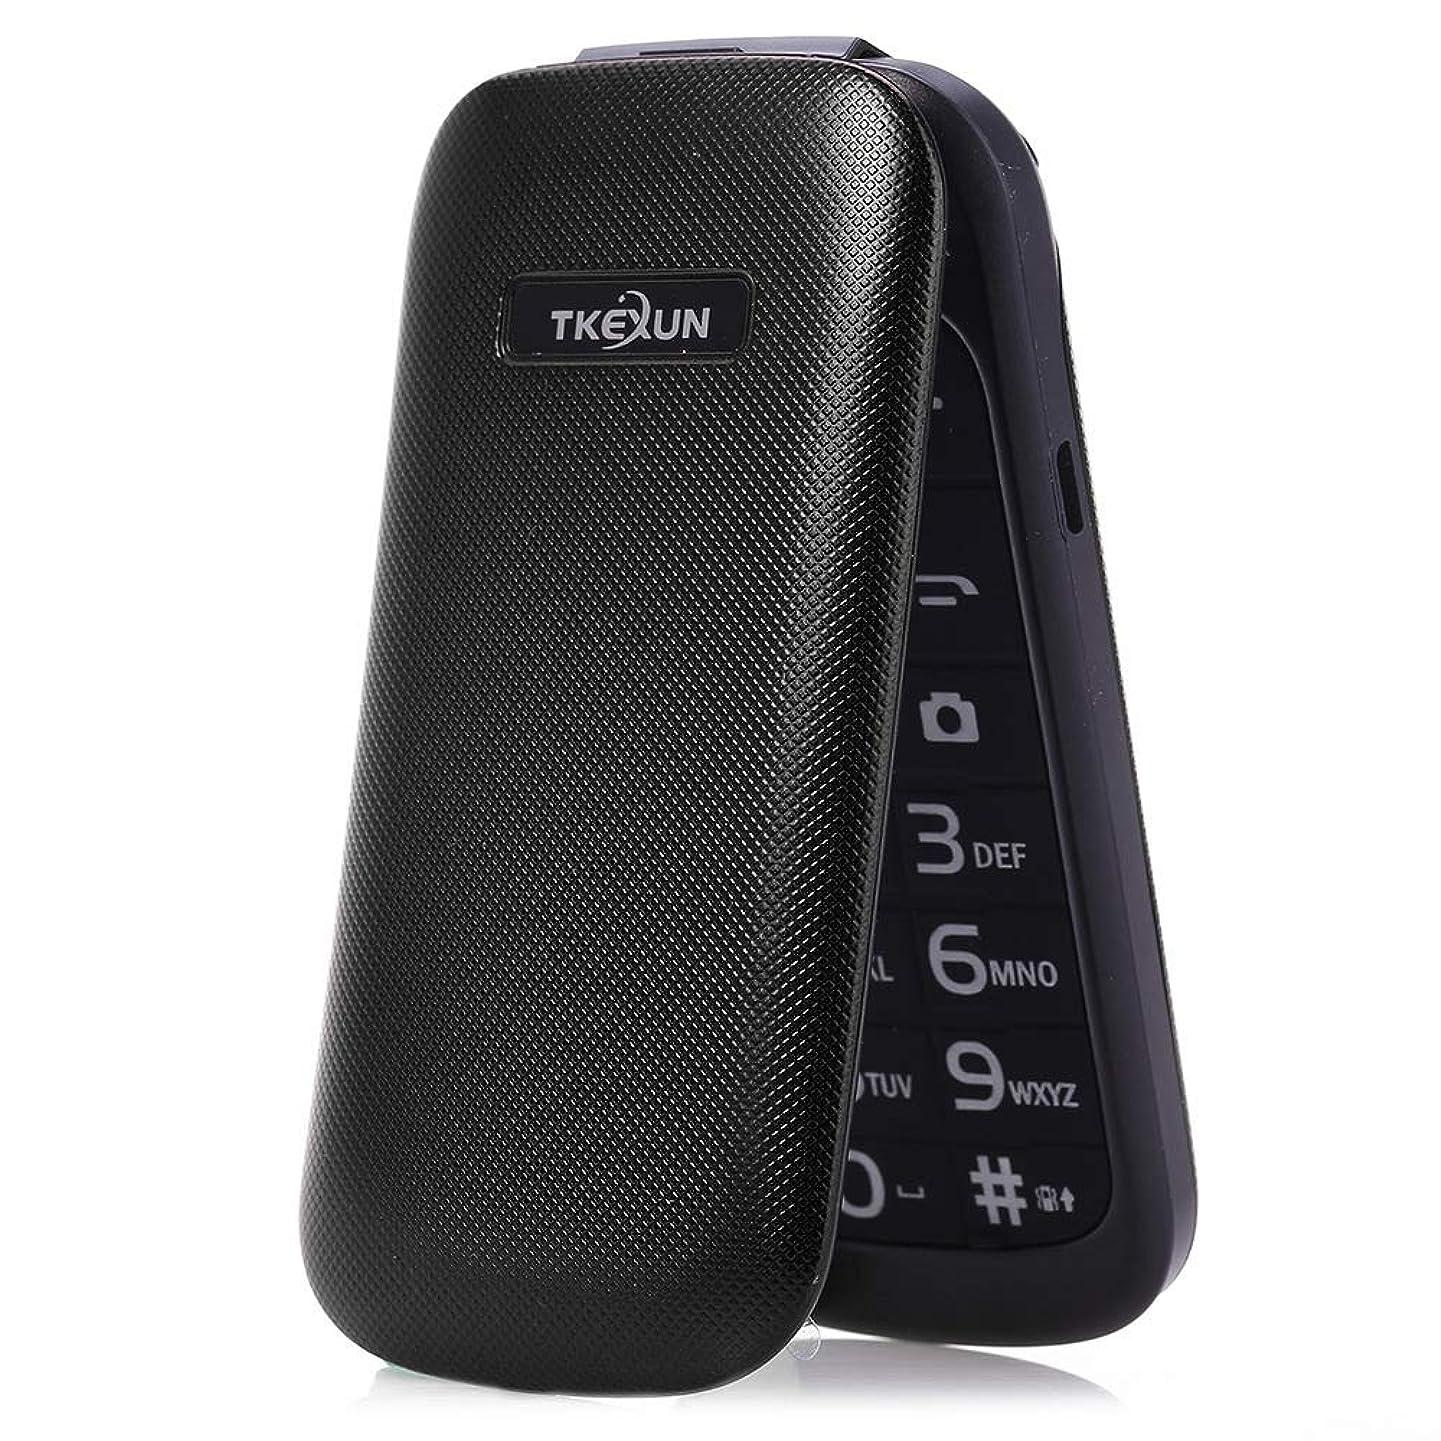 EbuyChX E1190A Quad Band Unlocked Phone with Sound Recorder Alarm Black